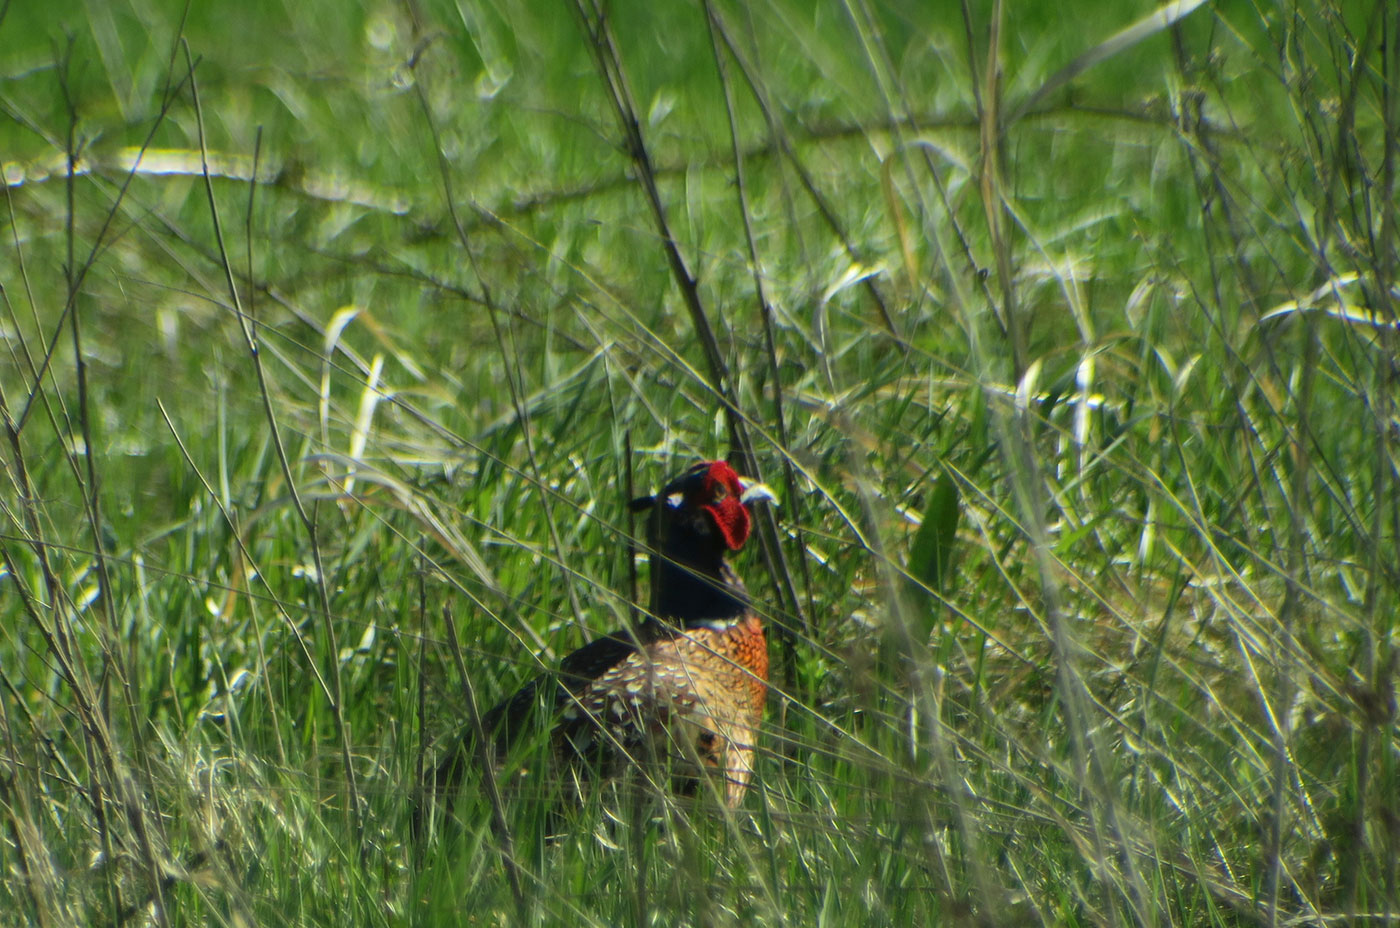 15_jagdfasan_common-pheasant_abfanggraben_2019-04-19_9109